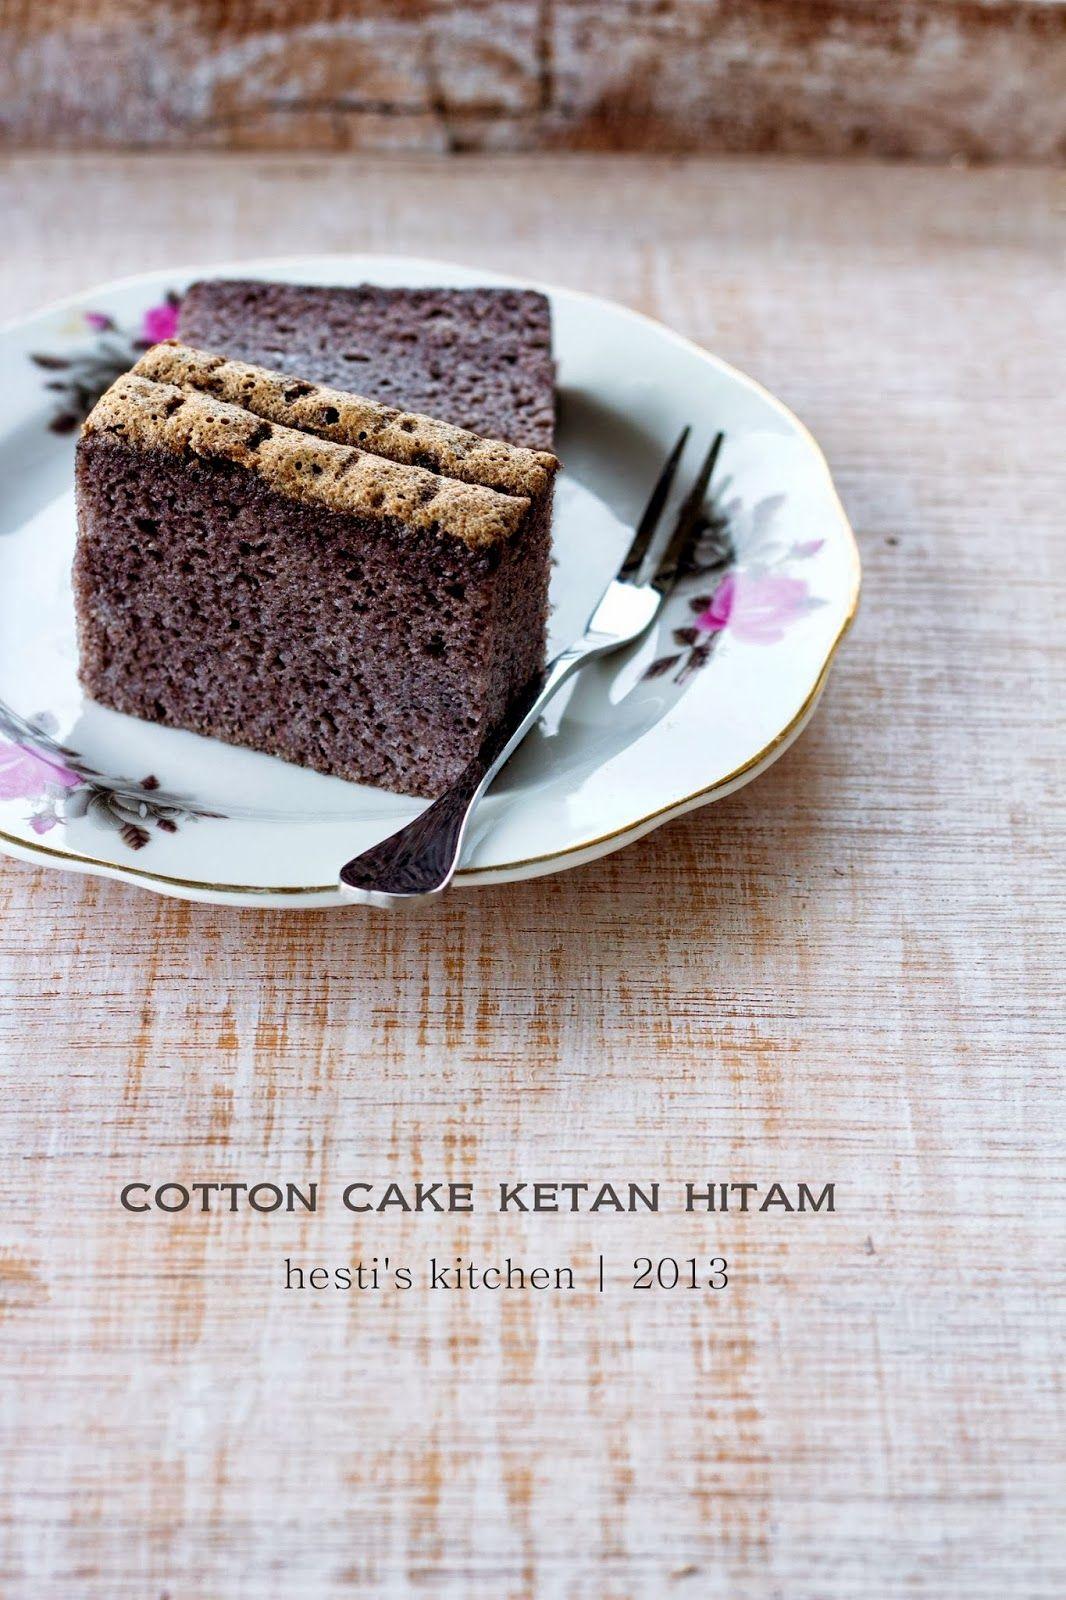 Cotton Cake Ketan Hitam Kue lezat, Resep makanan penutup